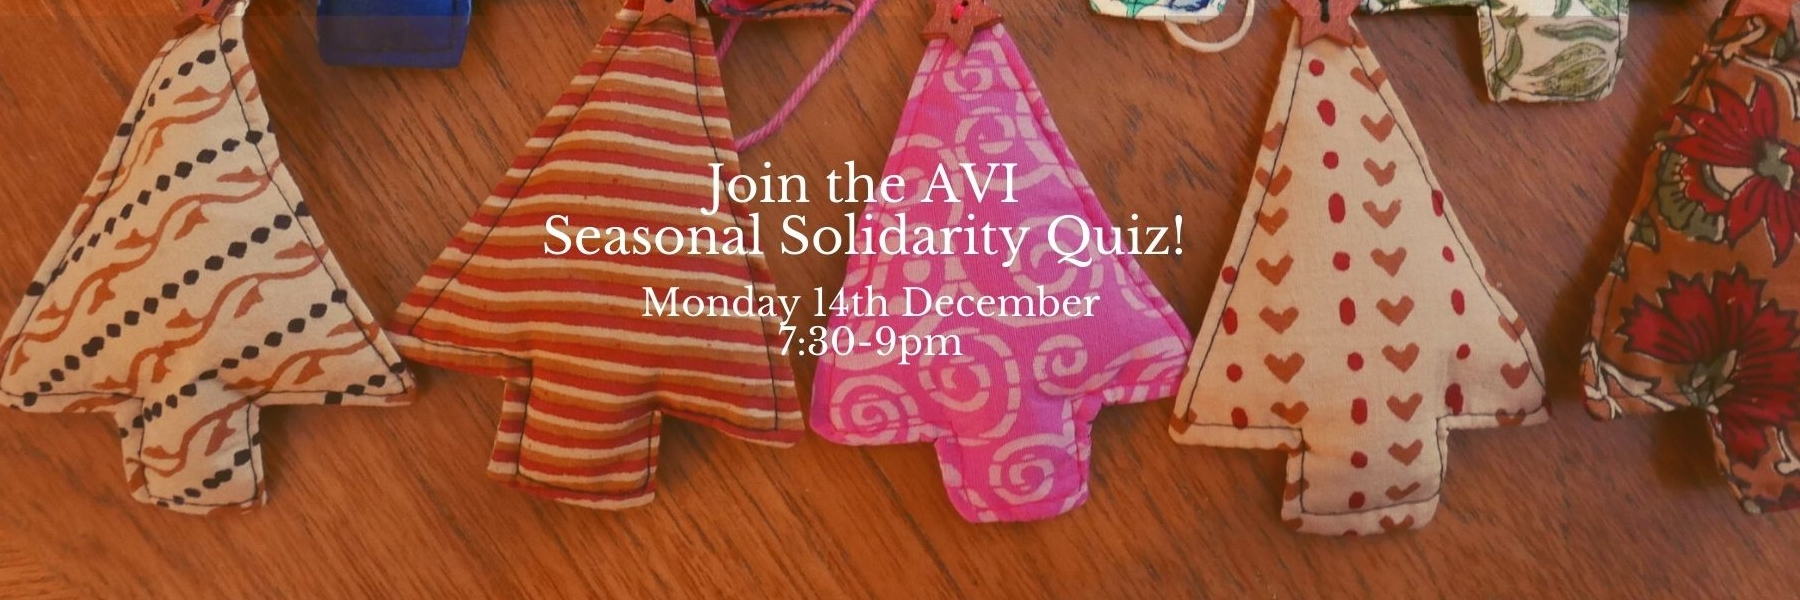 AVI Seasonal Solidarity Quiz!